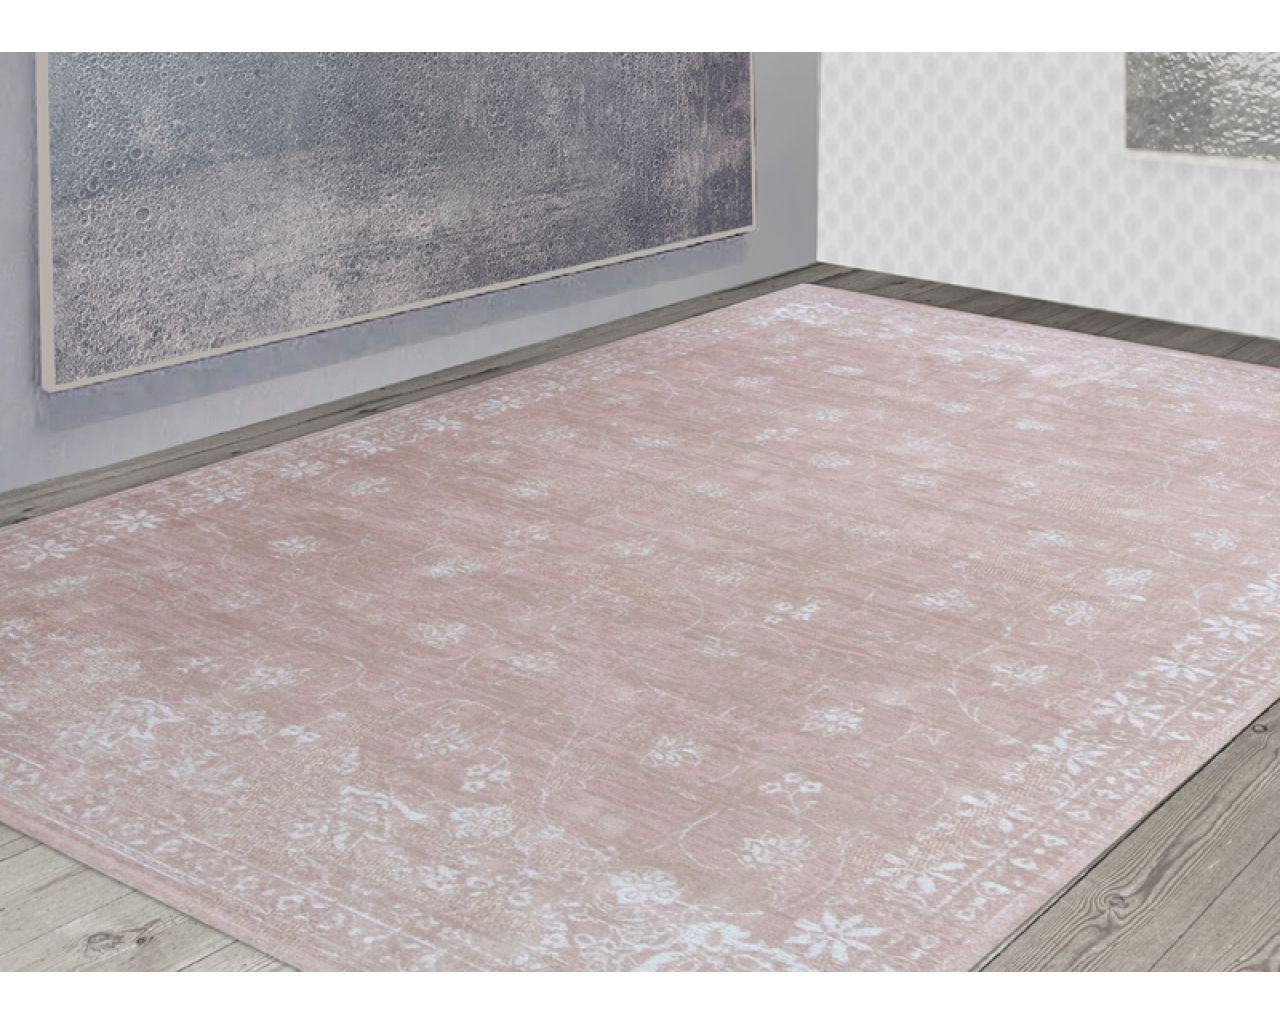 Tapijt Oud Roze : Bol hoogpolig vloerkleed shaggy loca cm roze